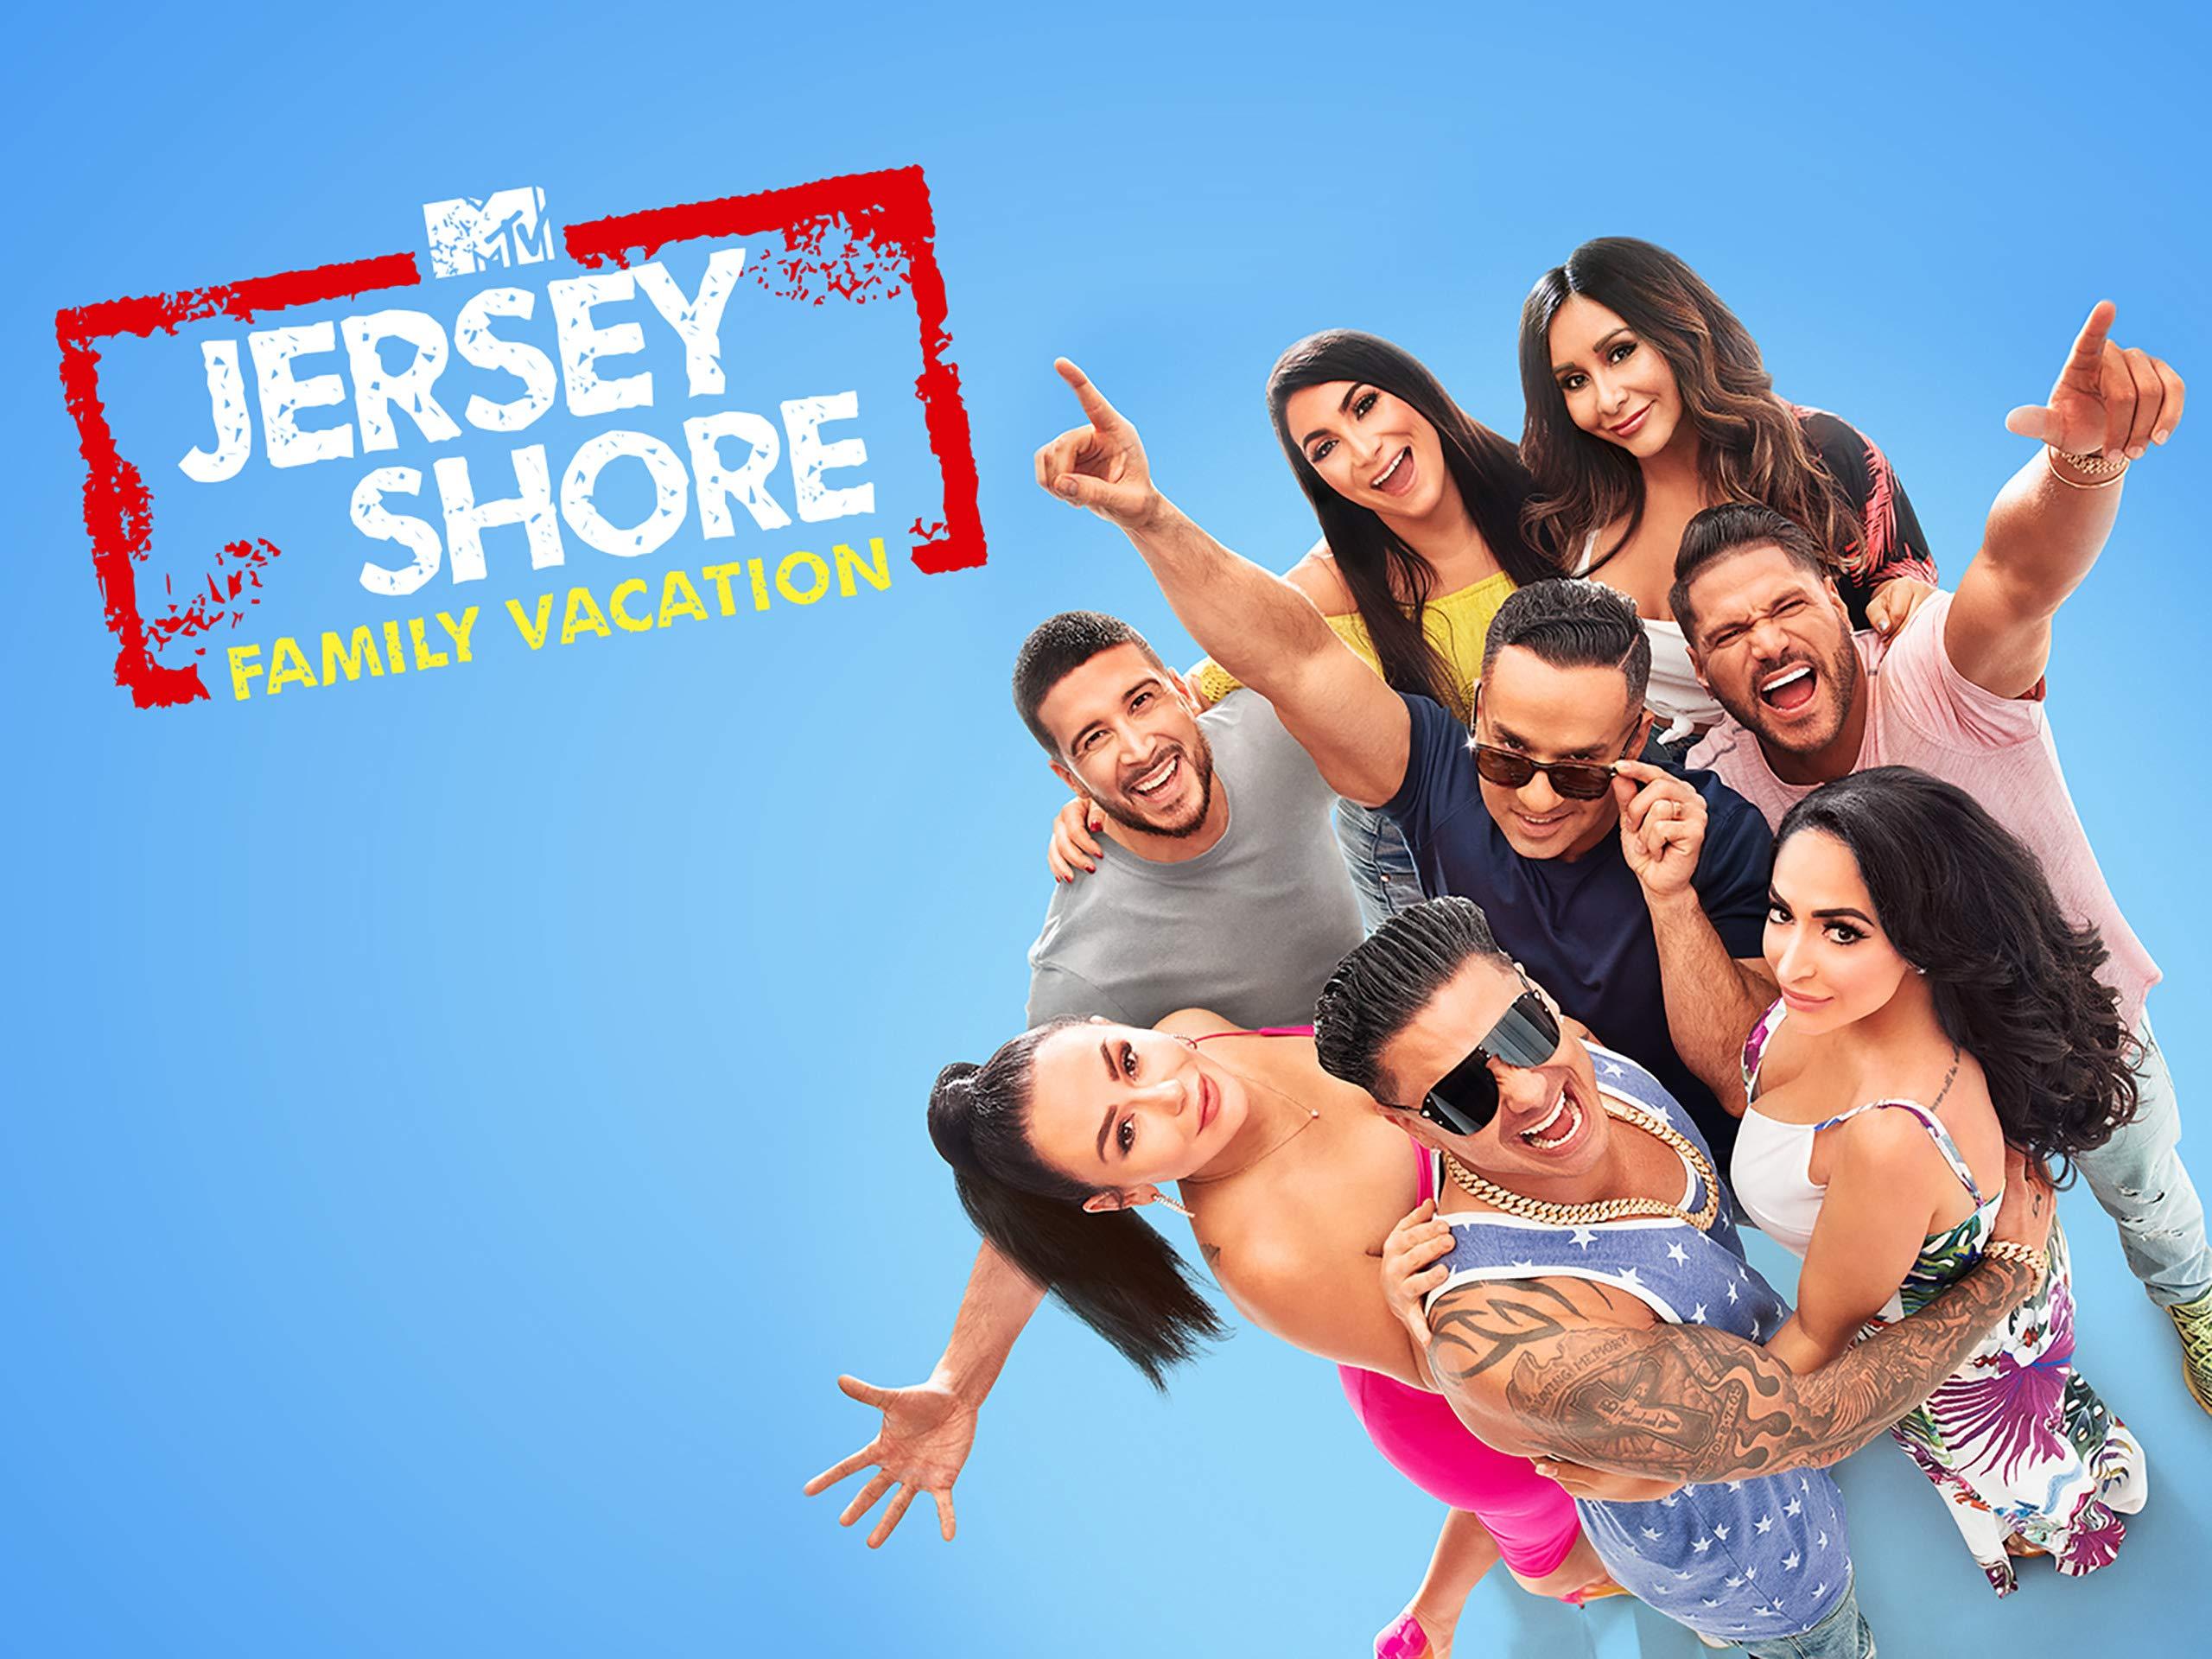 Dvigni Telefon Postavite Mizo Pogodba Jersey Shore Family Vacation S01e06 Torrent Pascalkondo Com